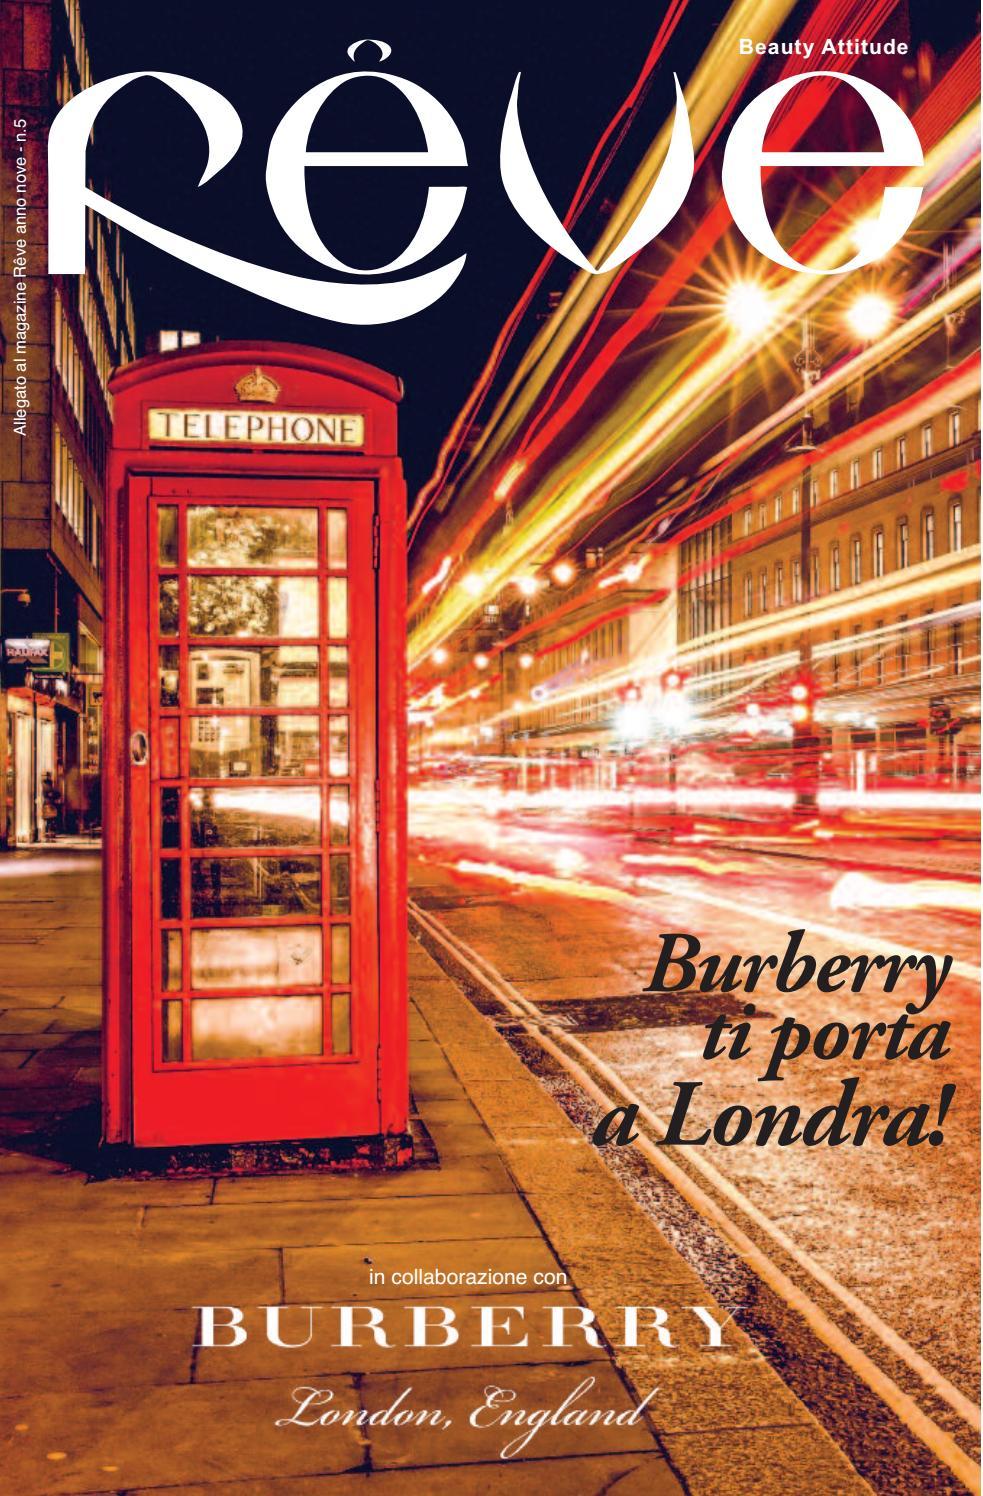 Burberry Brit Store A Milano : Reve inserto burberry by unique media issuu